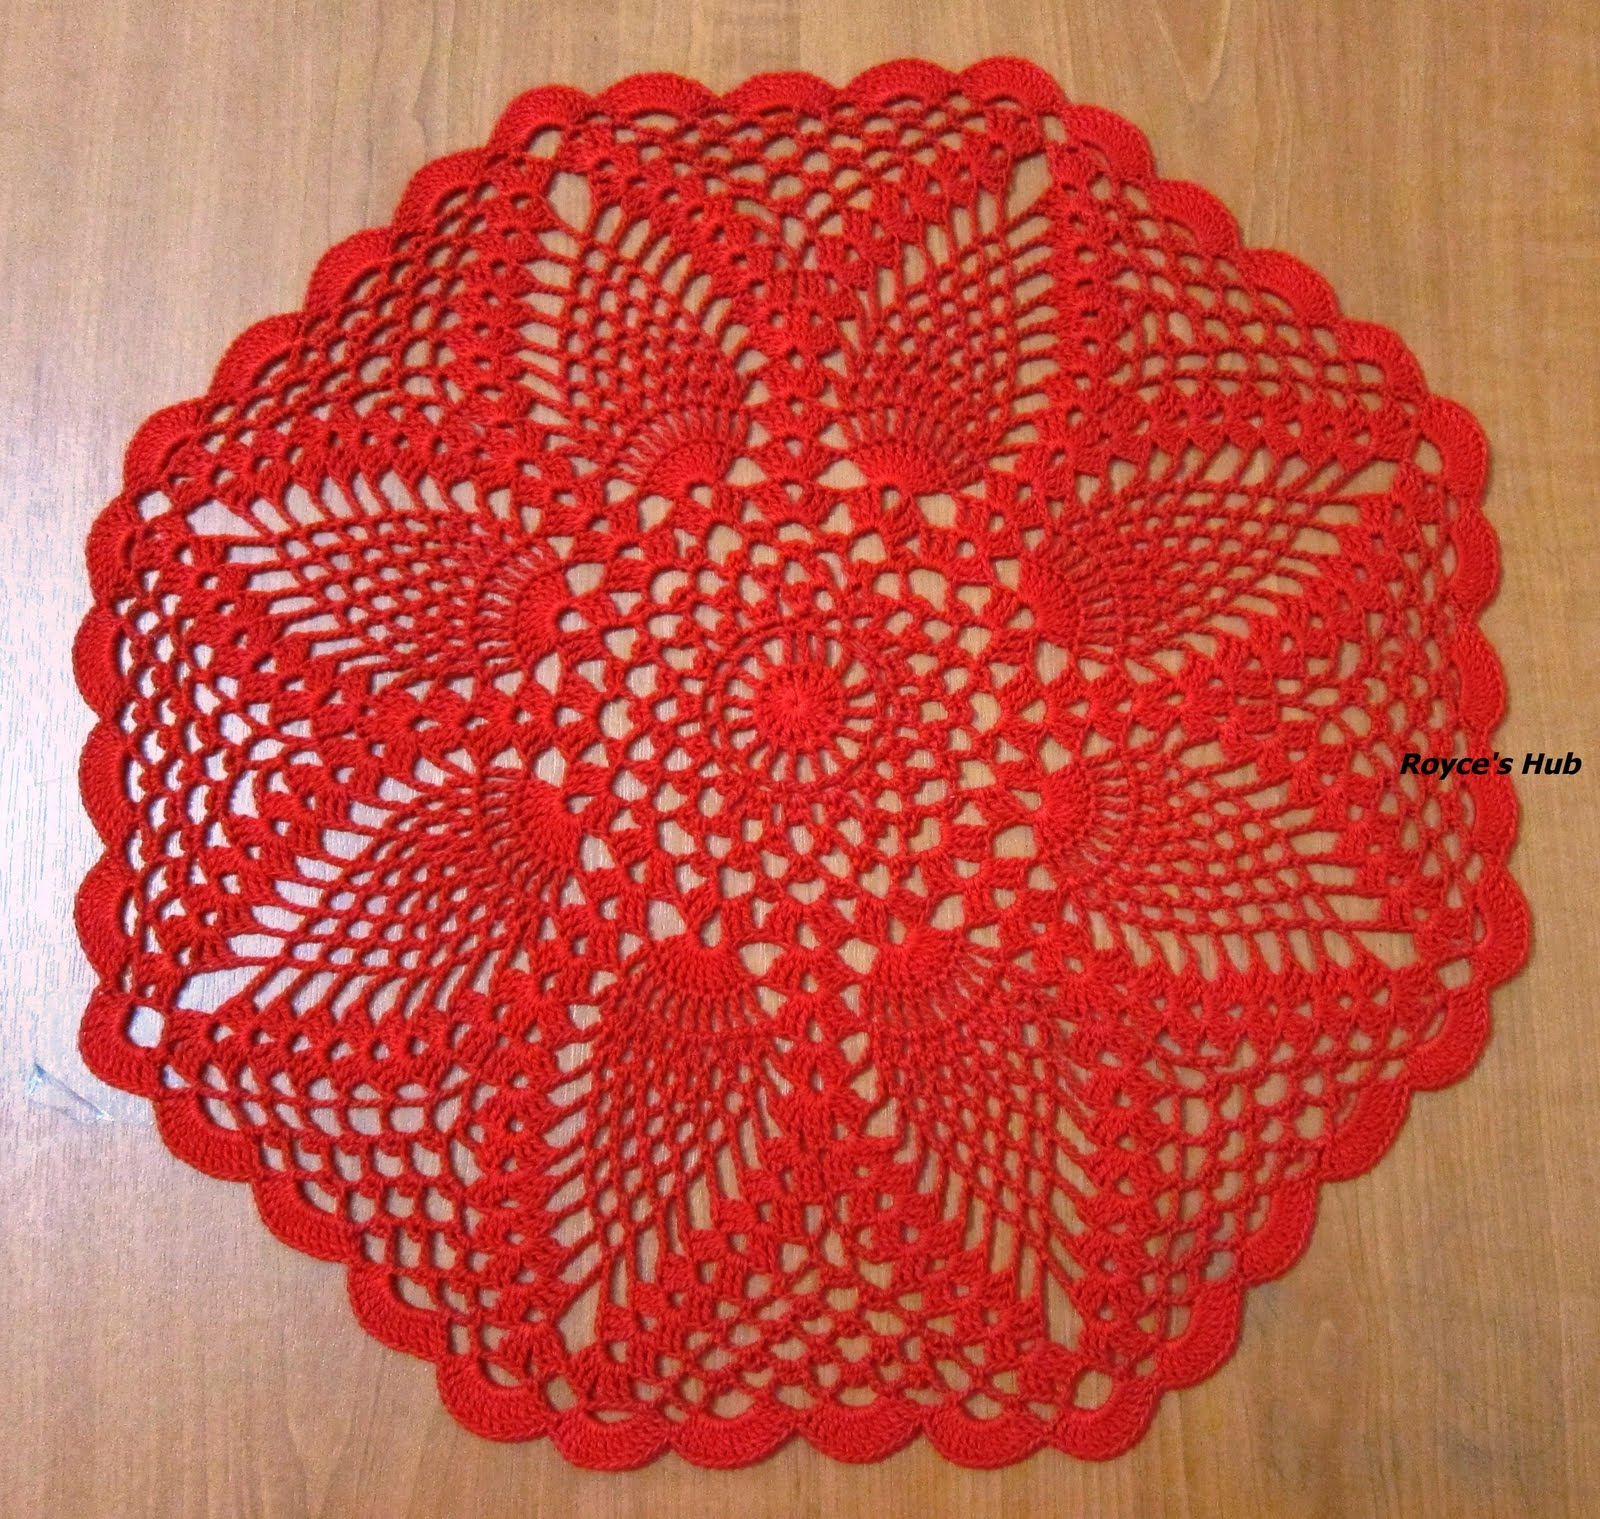 Crochet Pineapple Doily Patterns Oval Diagram Pinterest Royces Hub Lace Octagon 1600x1519